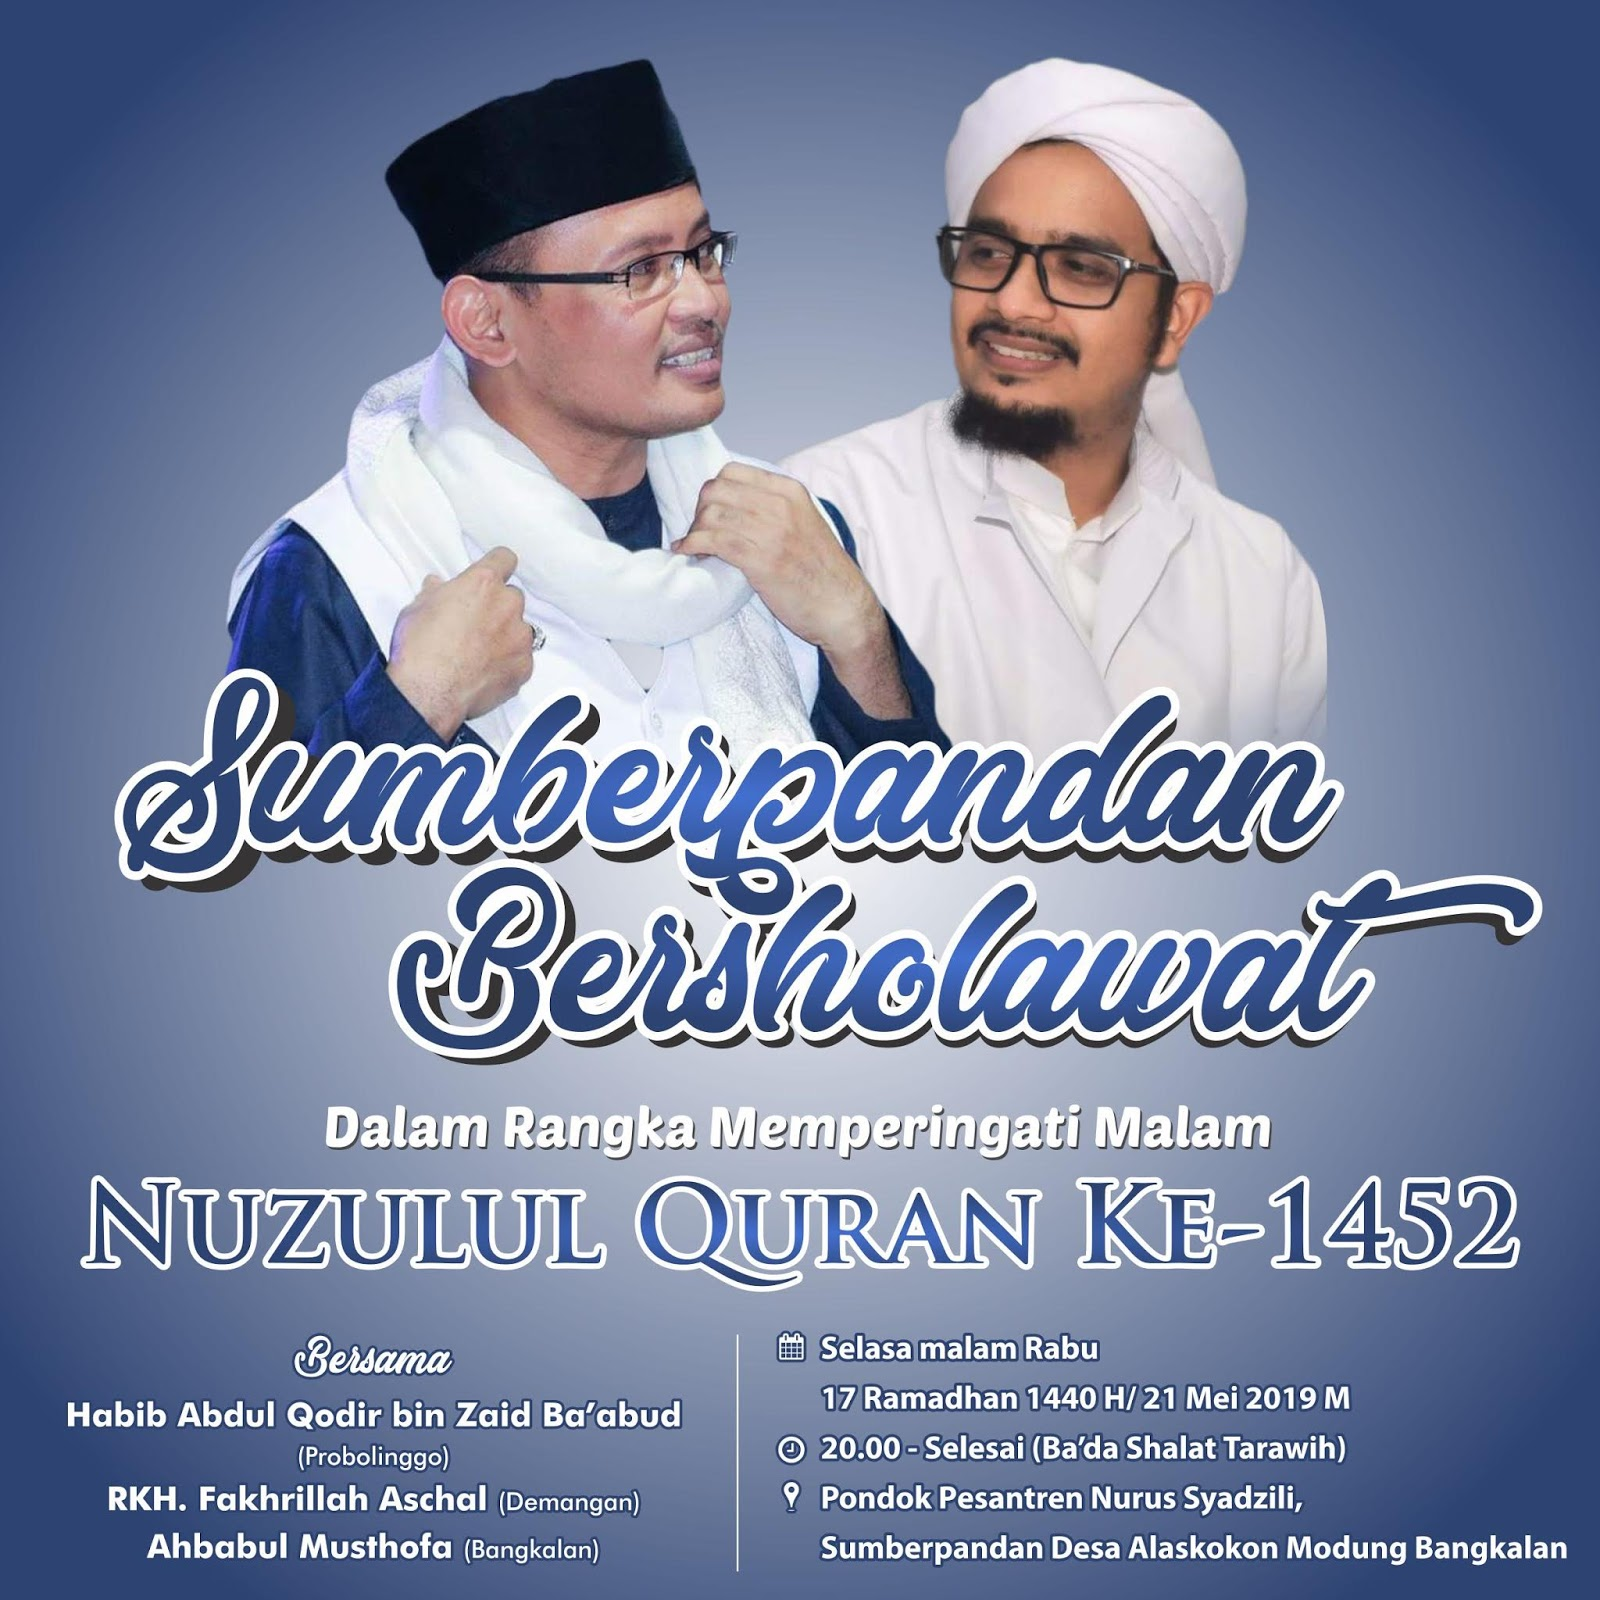 Hadirilah Nuzulul Qur'an Ke-1452